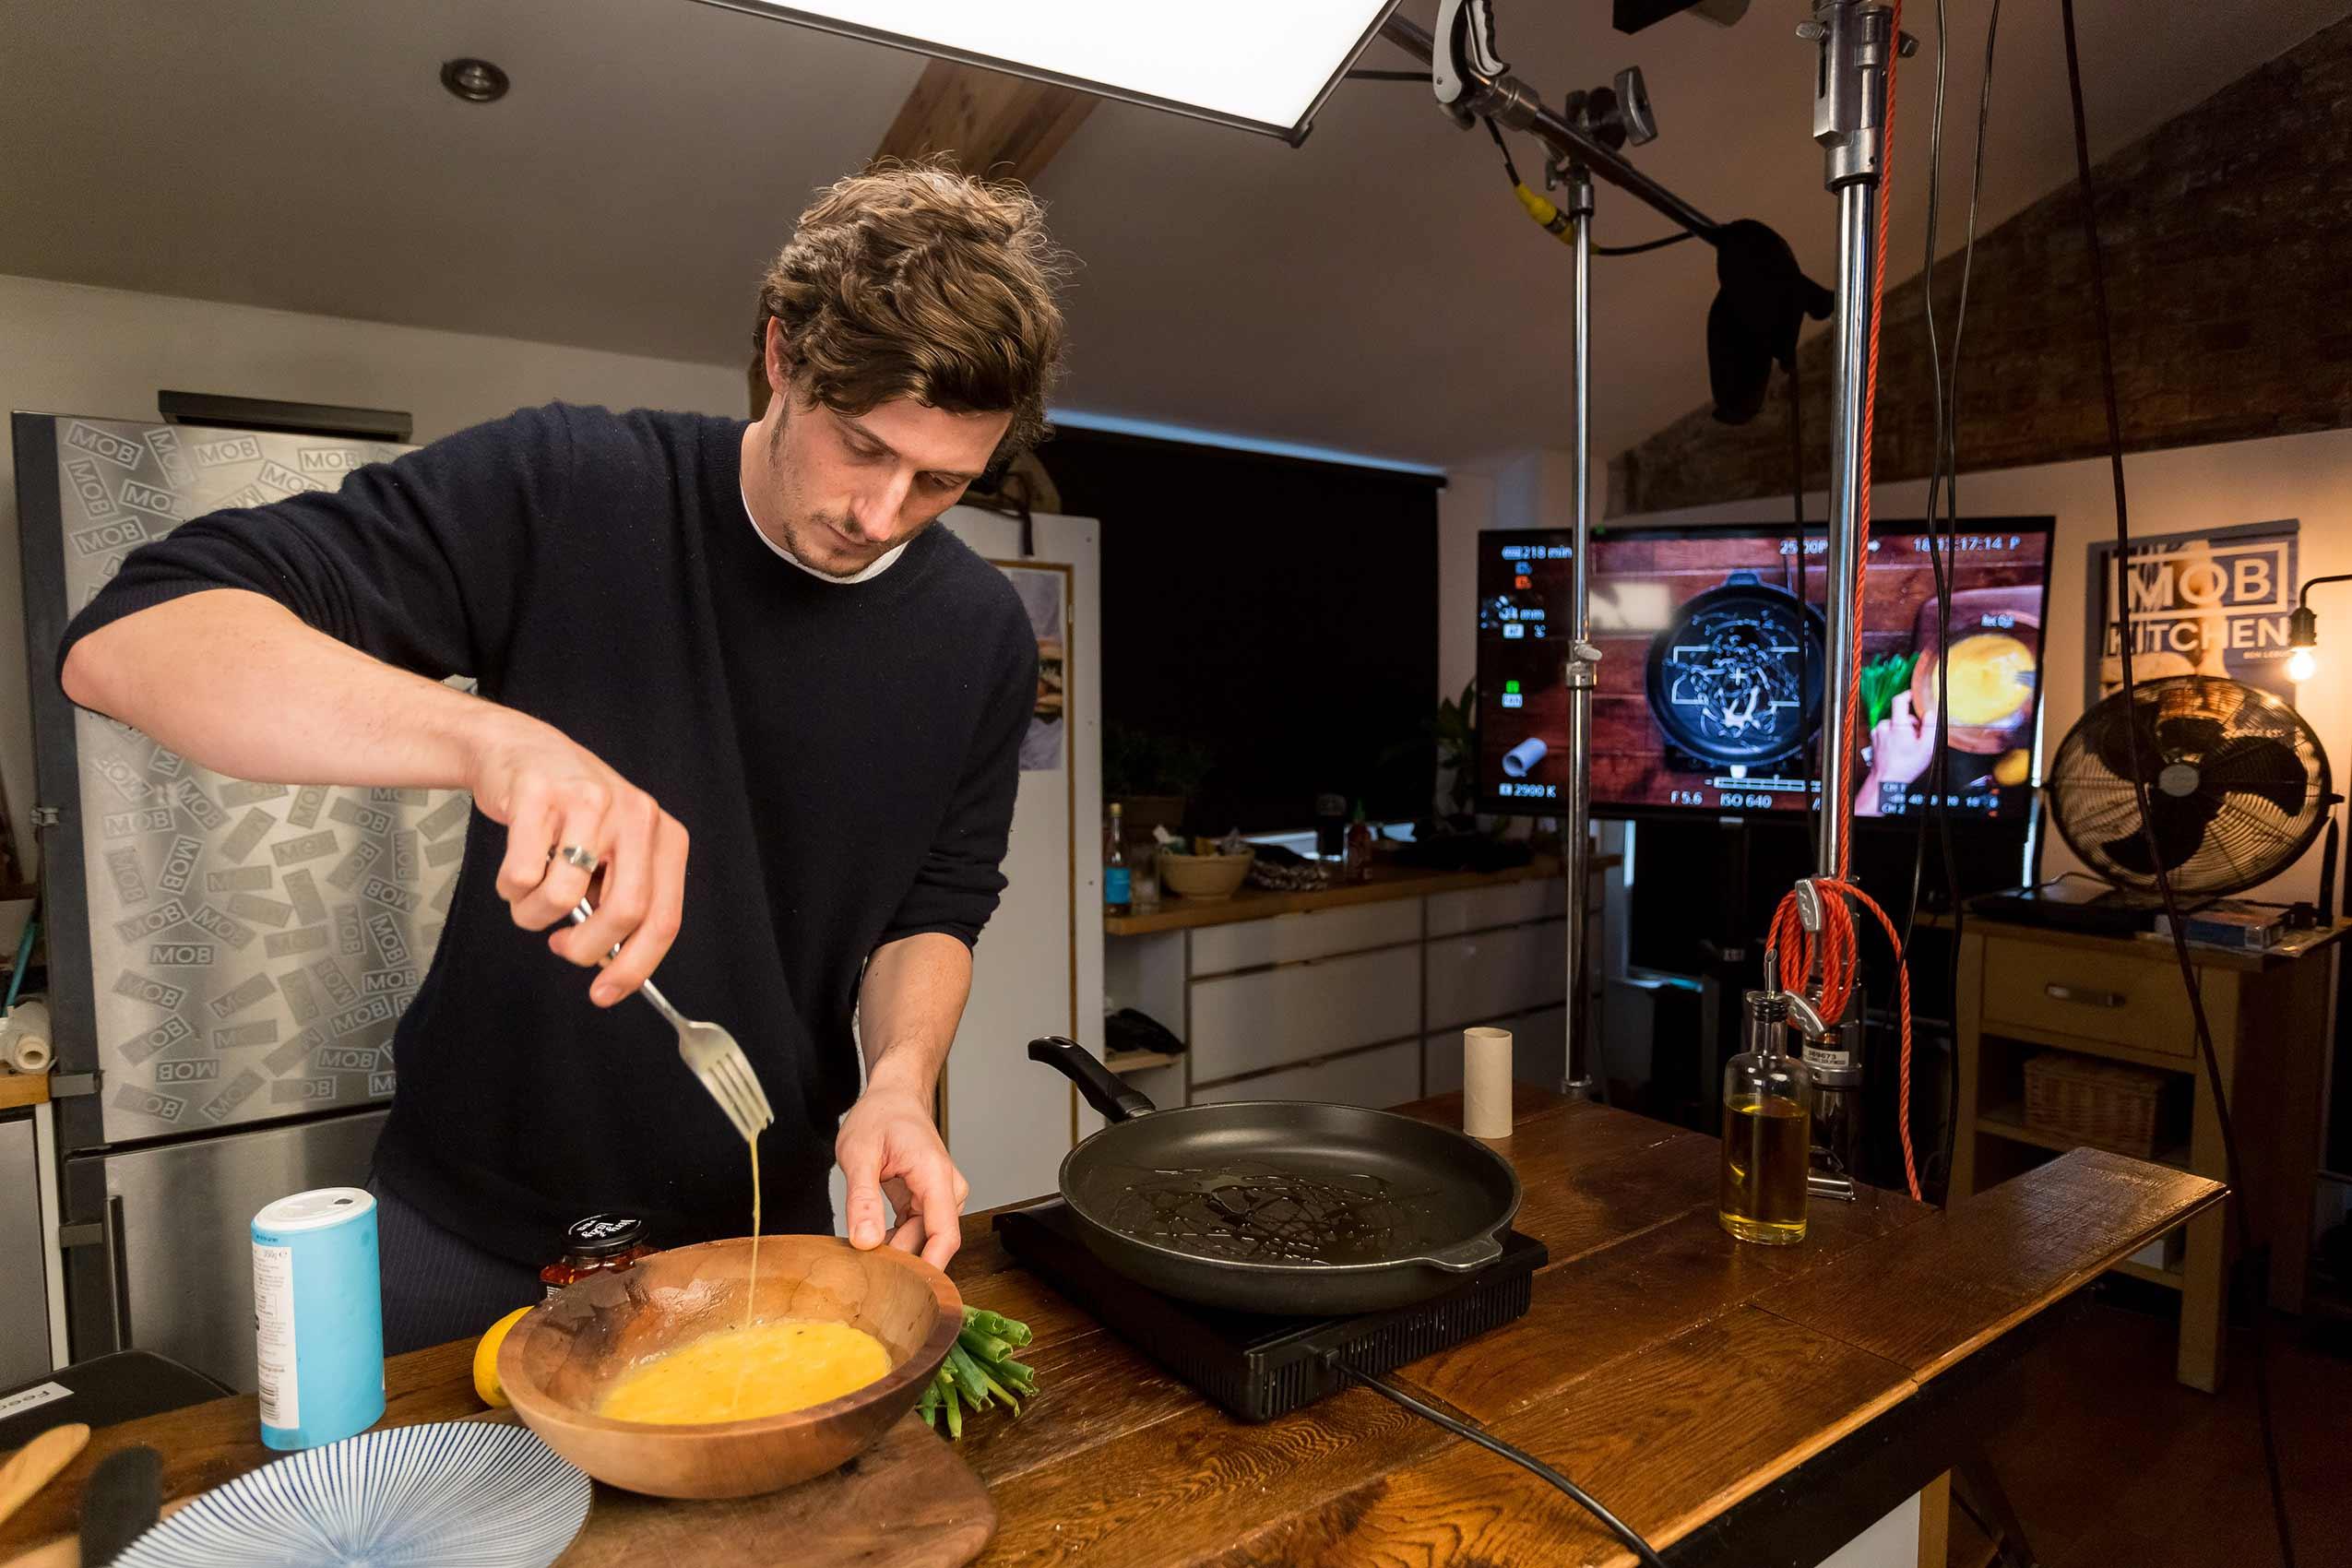 mob kitchen ben lebus cooking in london workshop